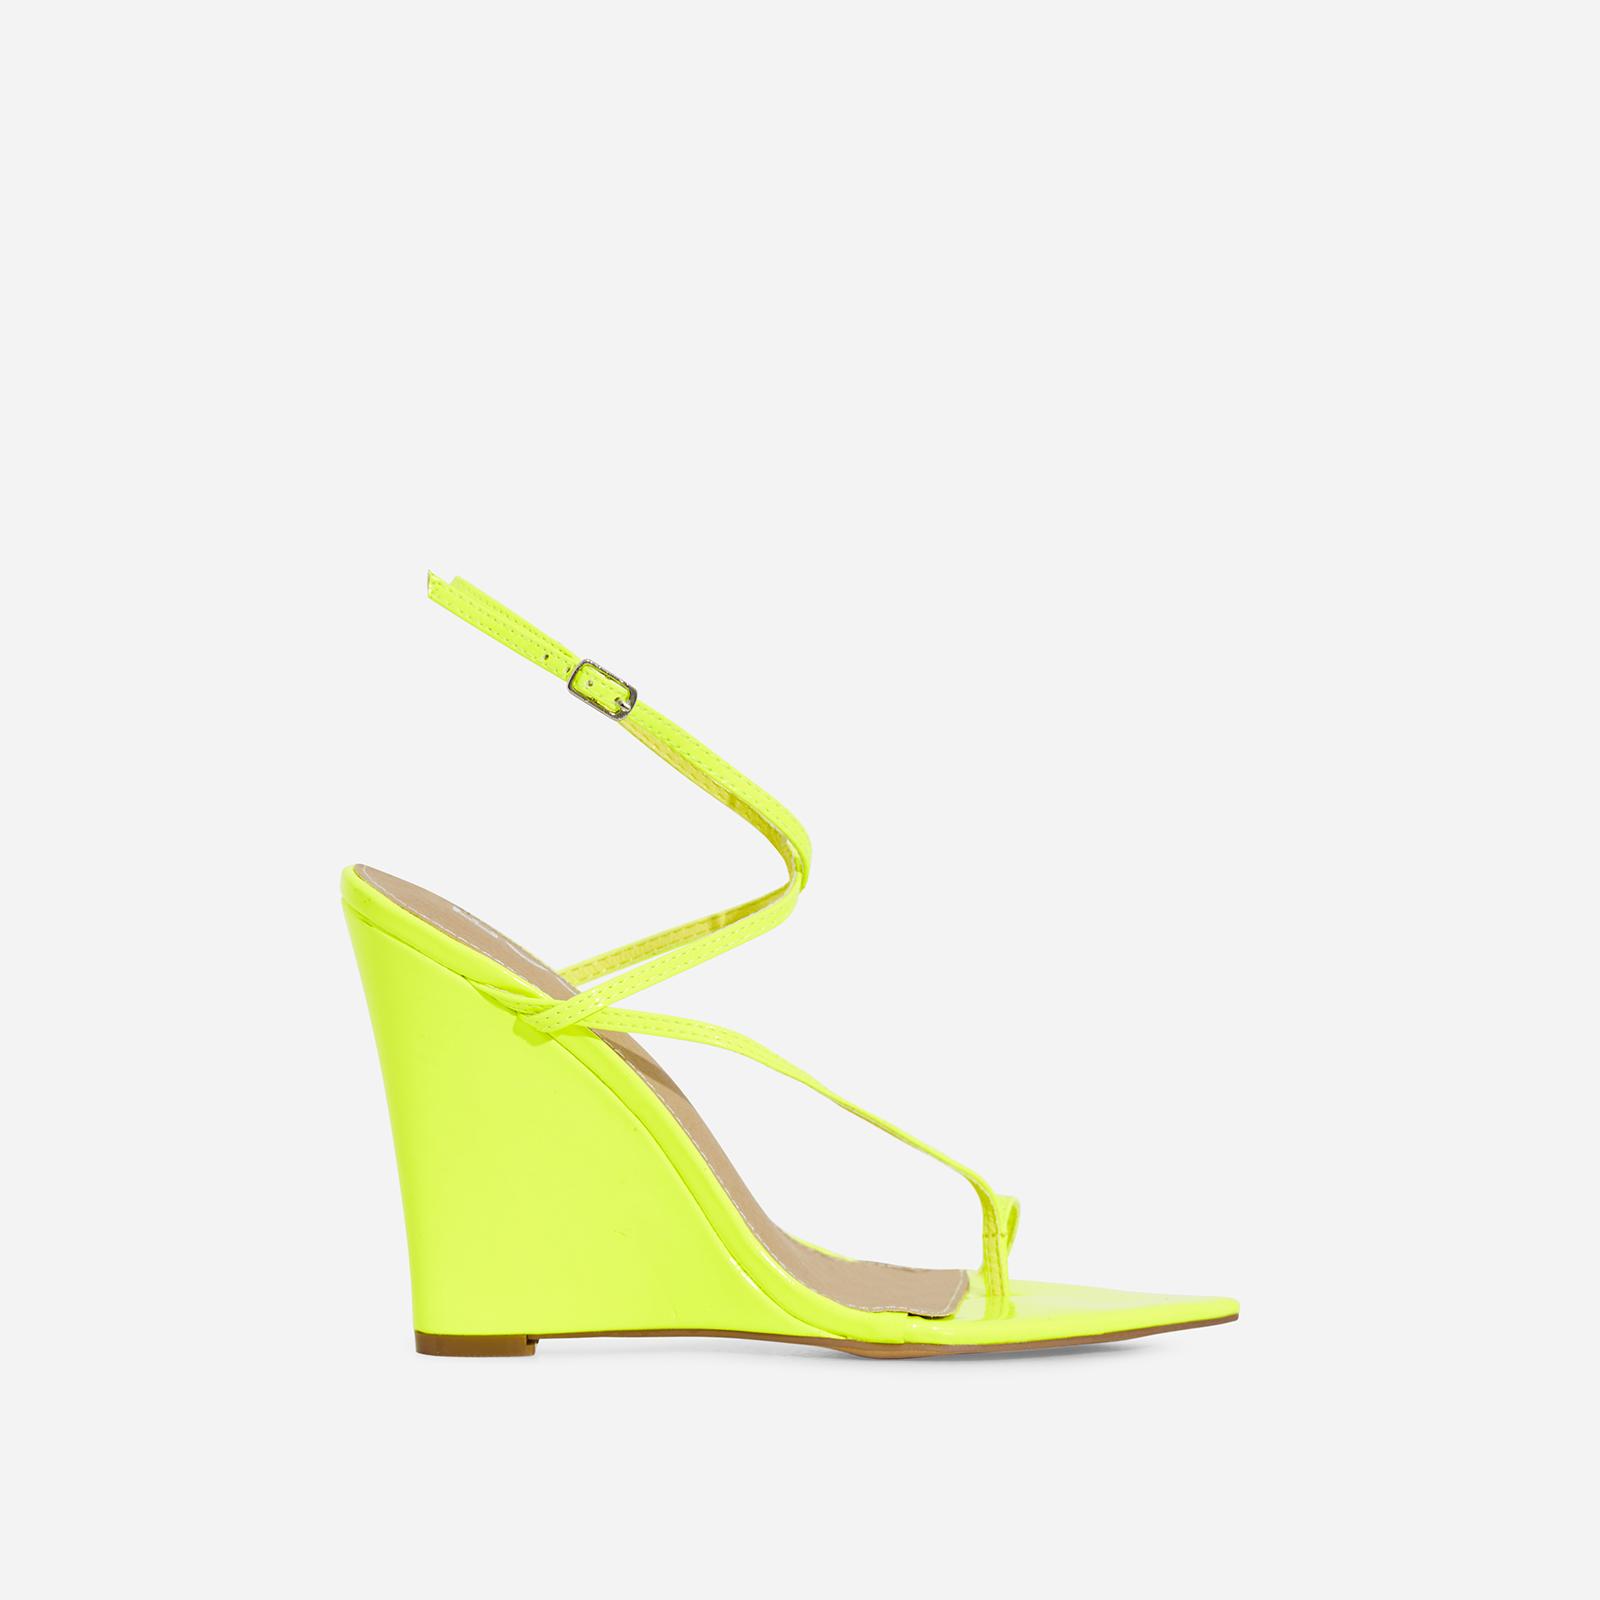 Melanie Toe Strap Wedge Heel In Lime Green Patent